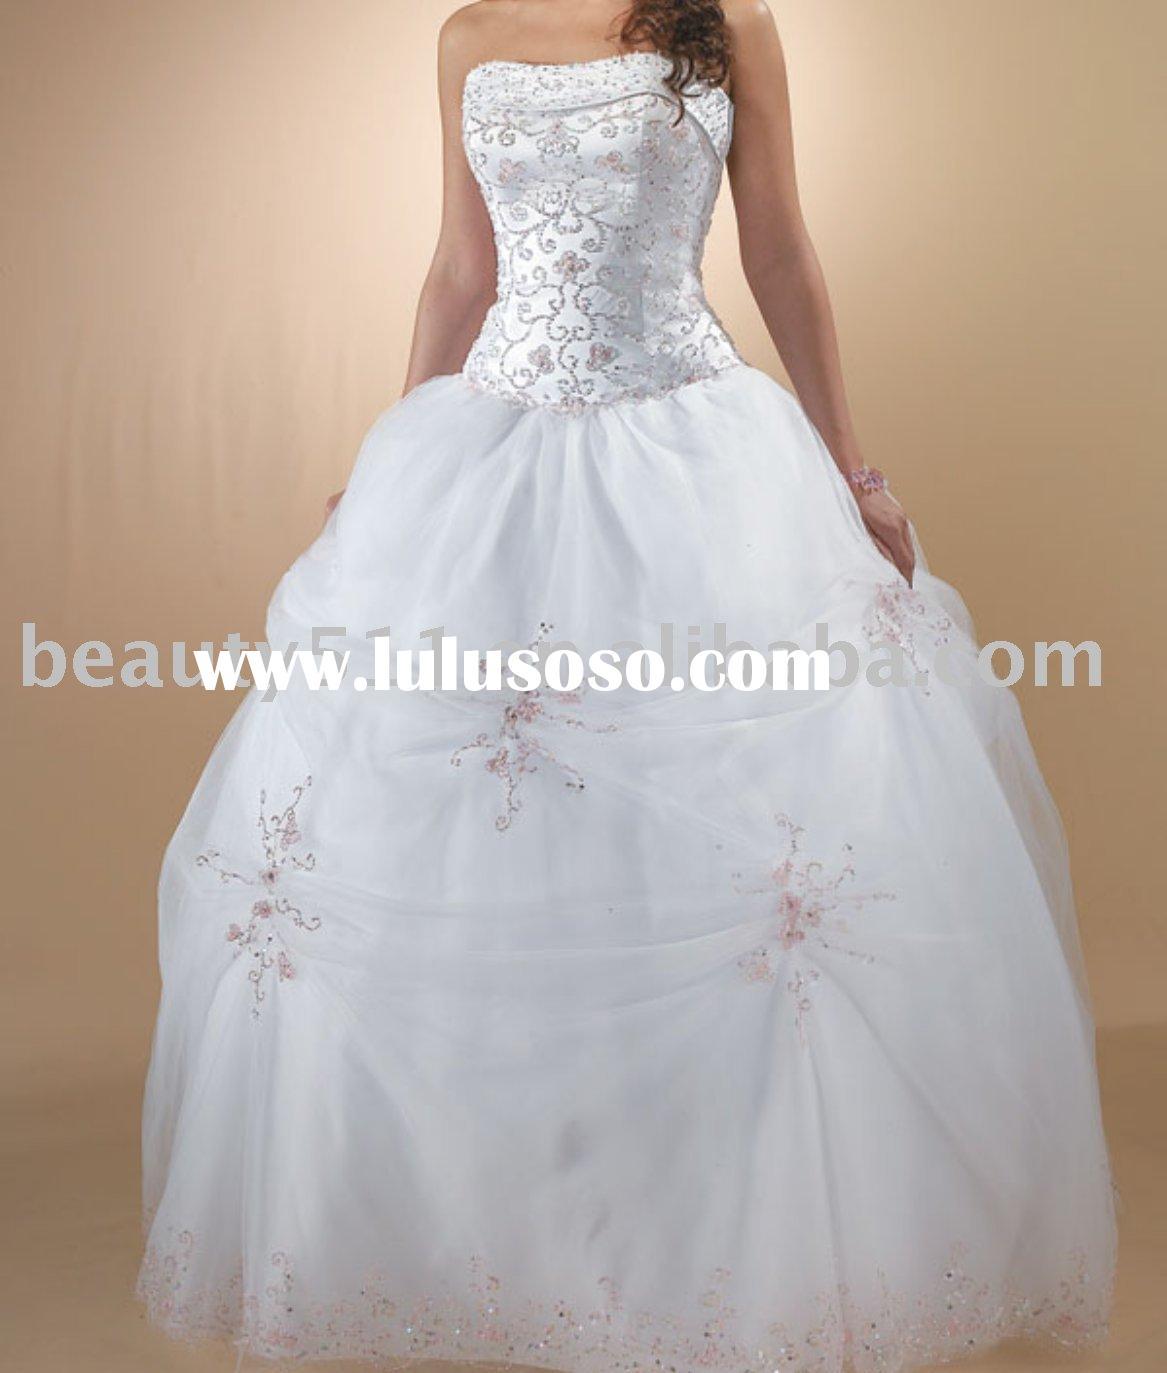 Wedding Dresses Perfect Halter neck wedding gowns